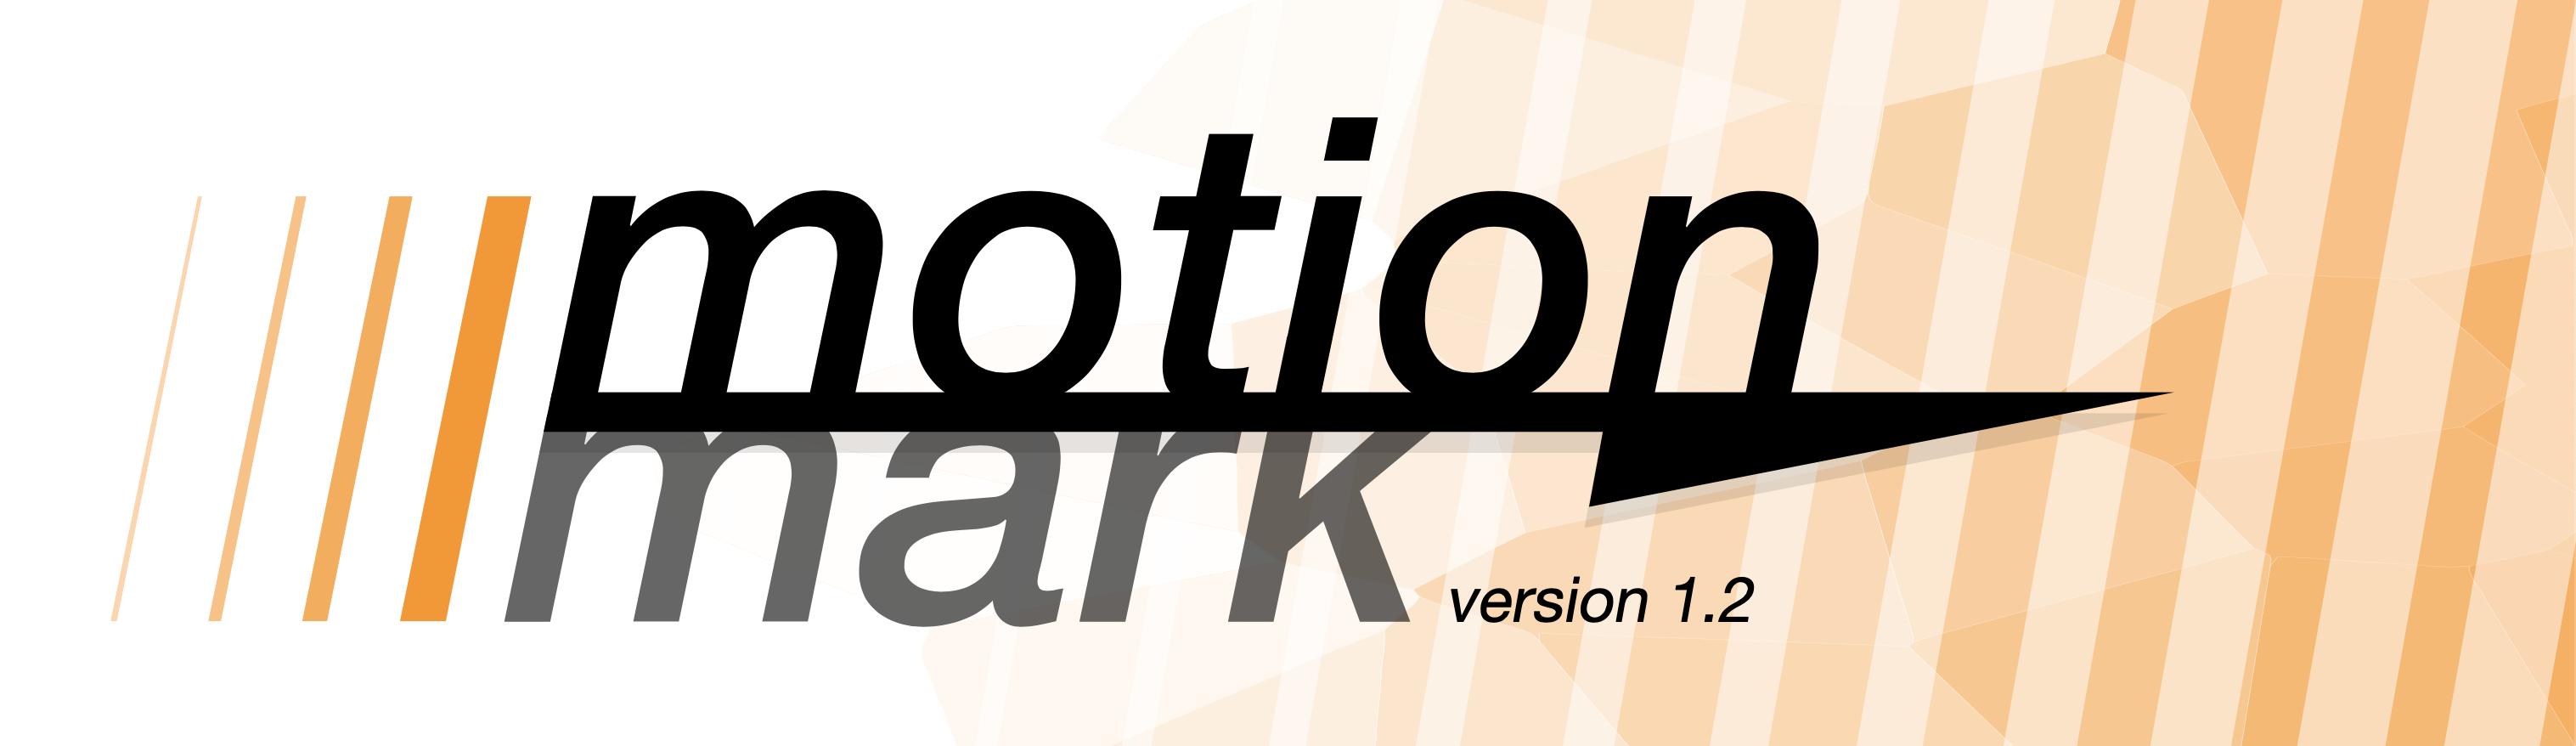 MotionMark Version 1.2